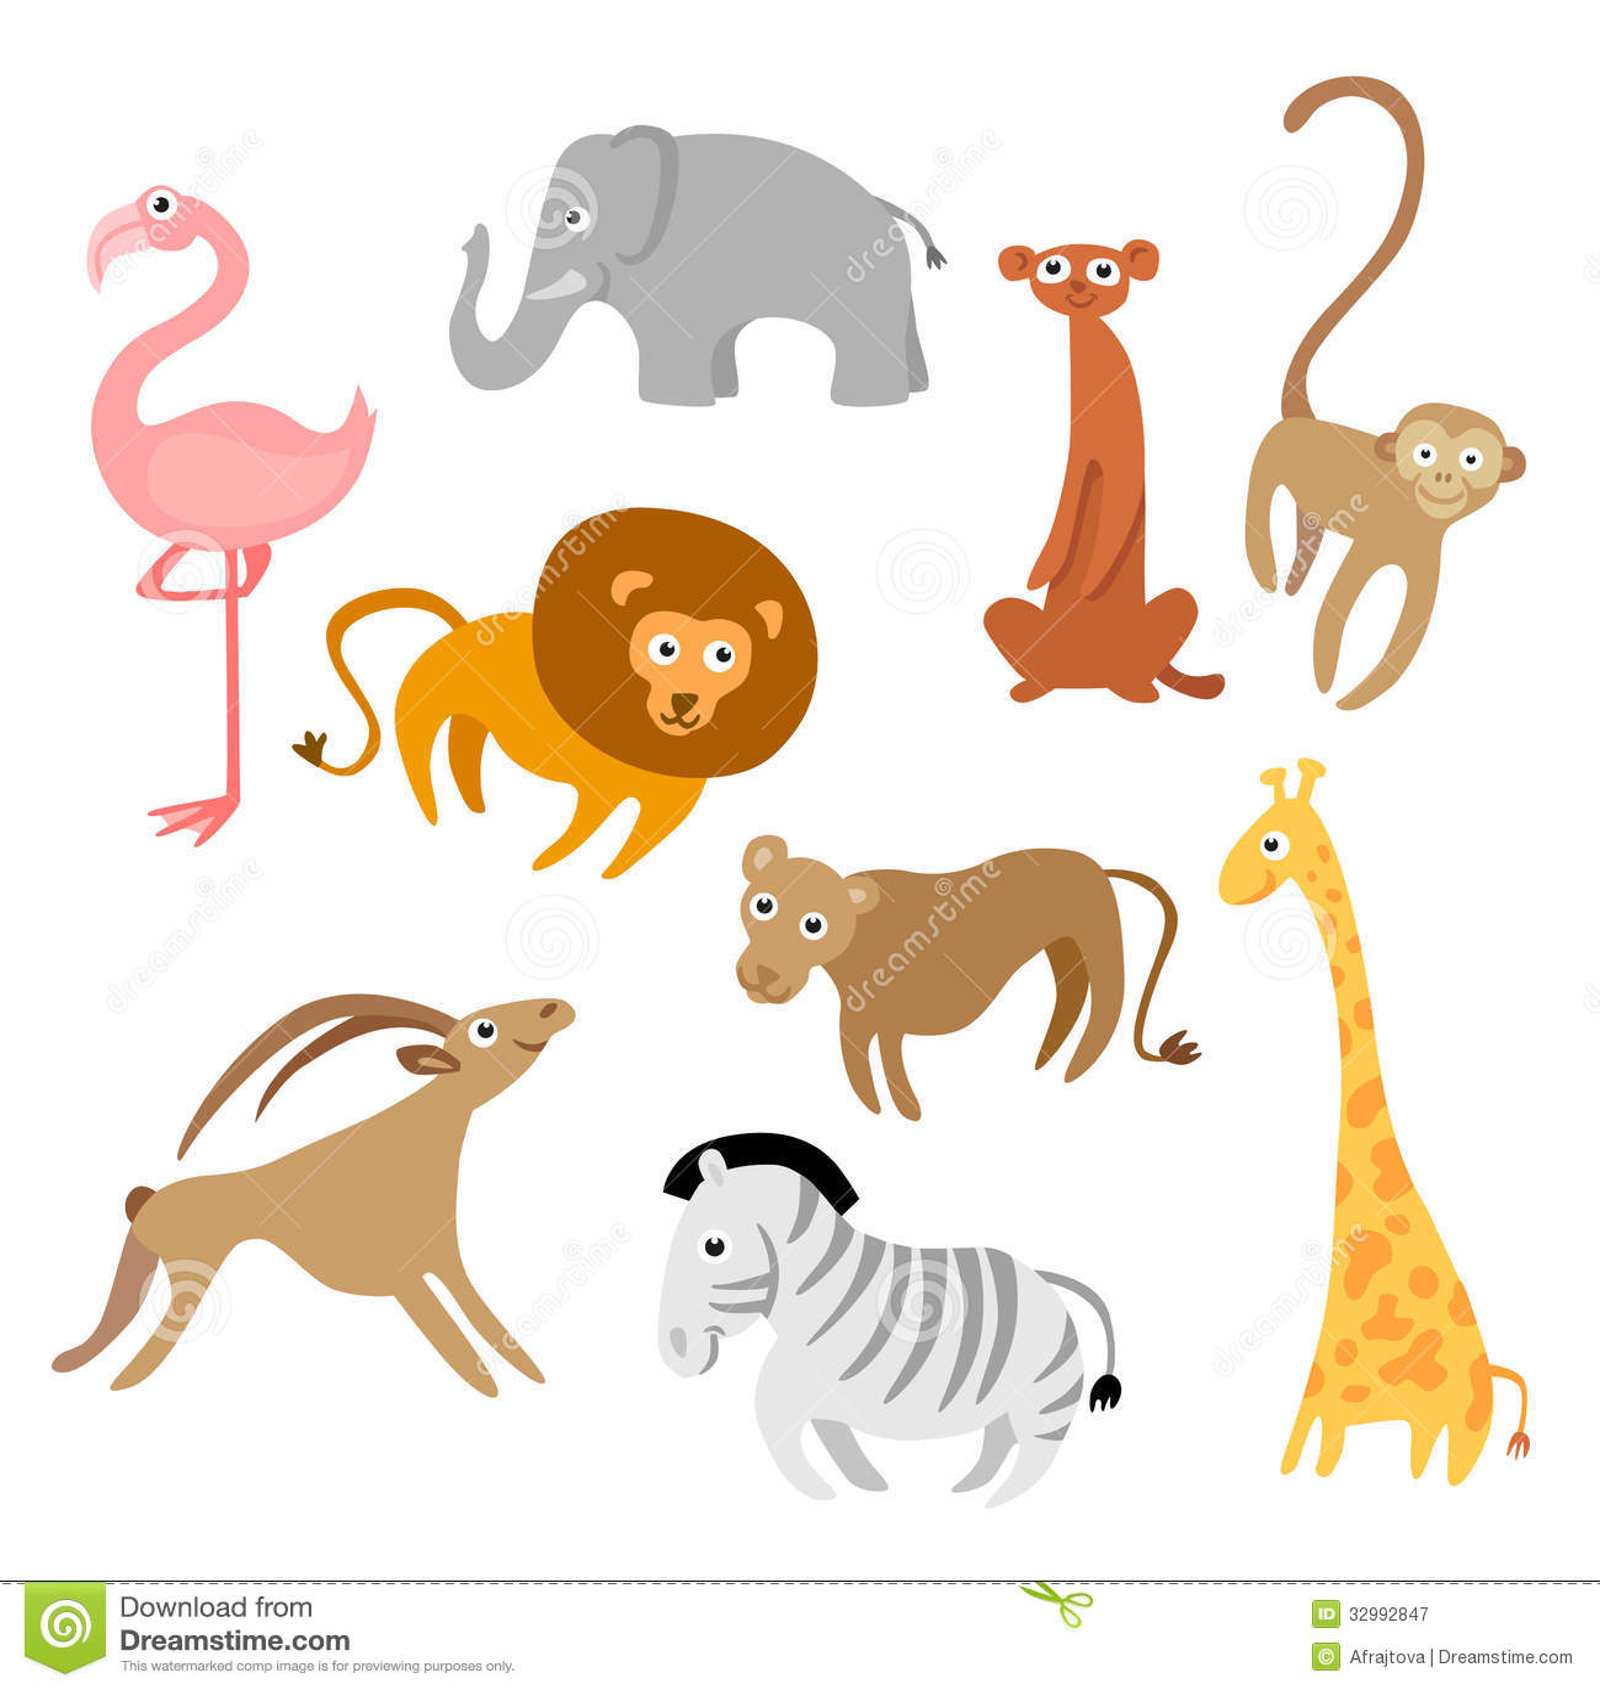 cartoon animals stock vector illustration of elephant 32992847